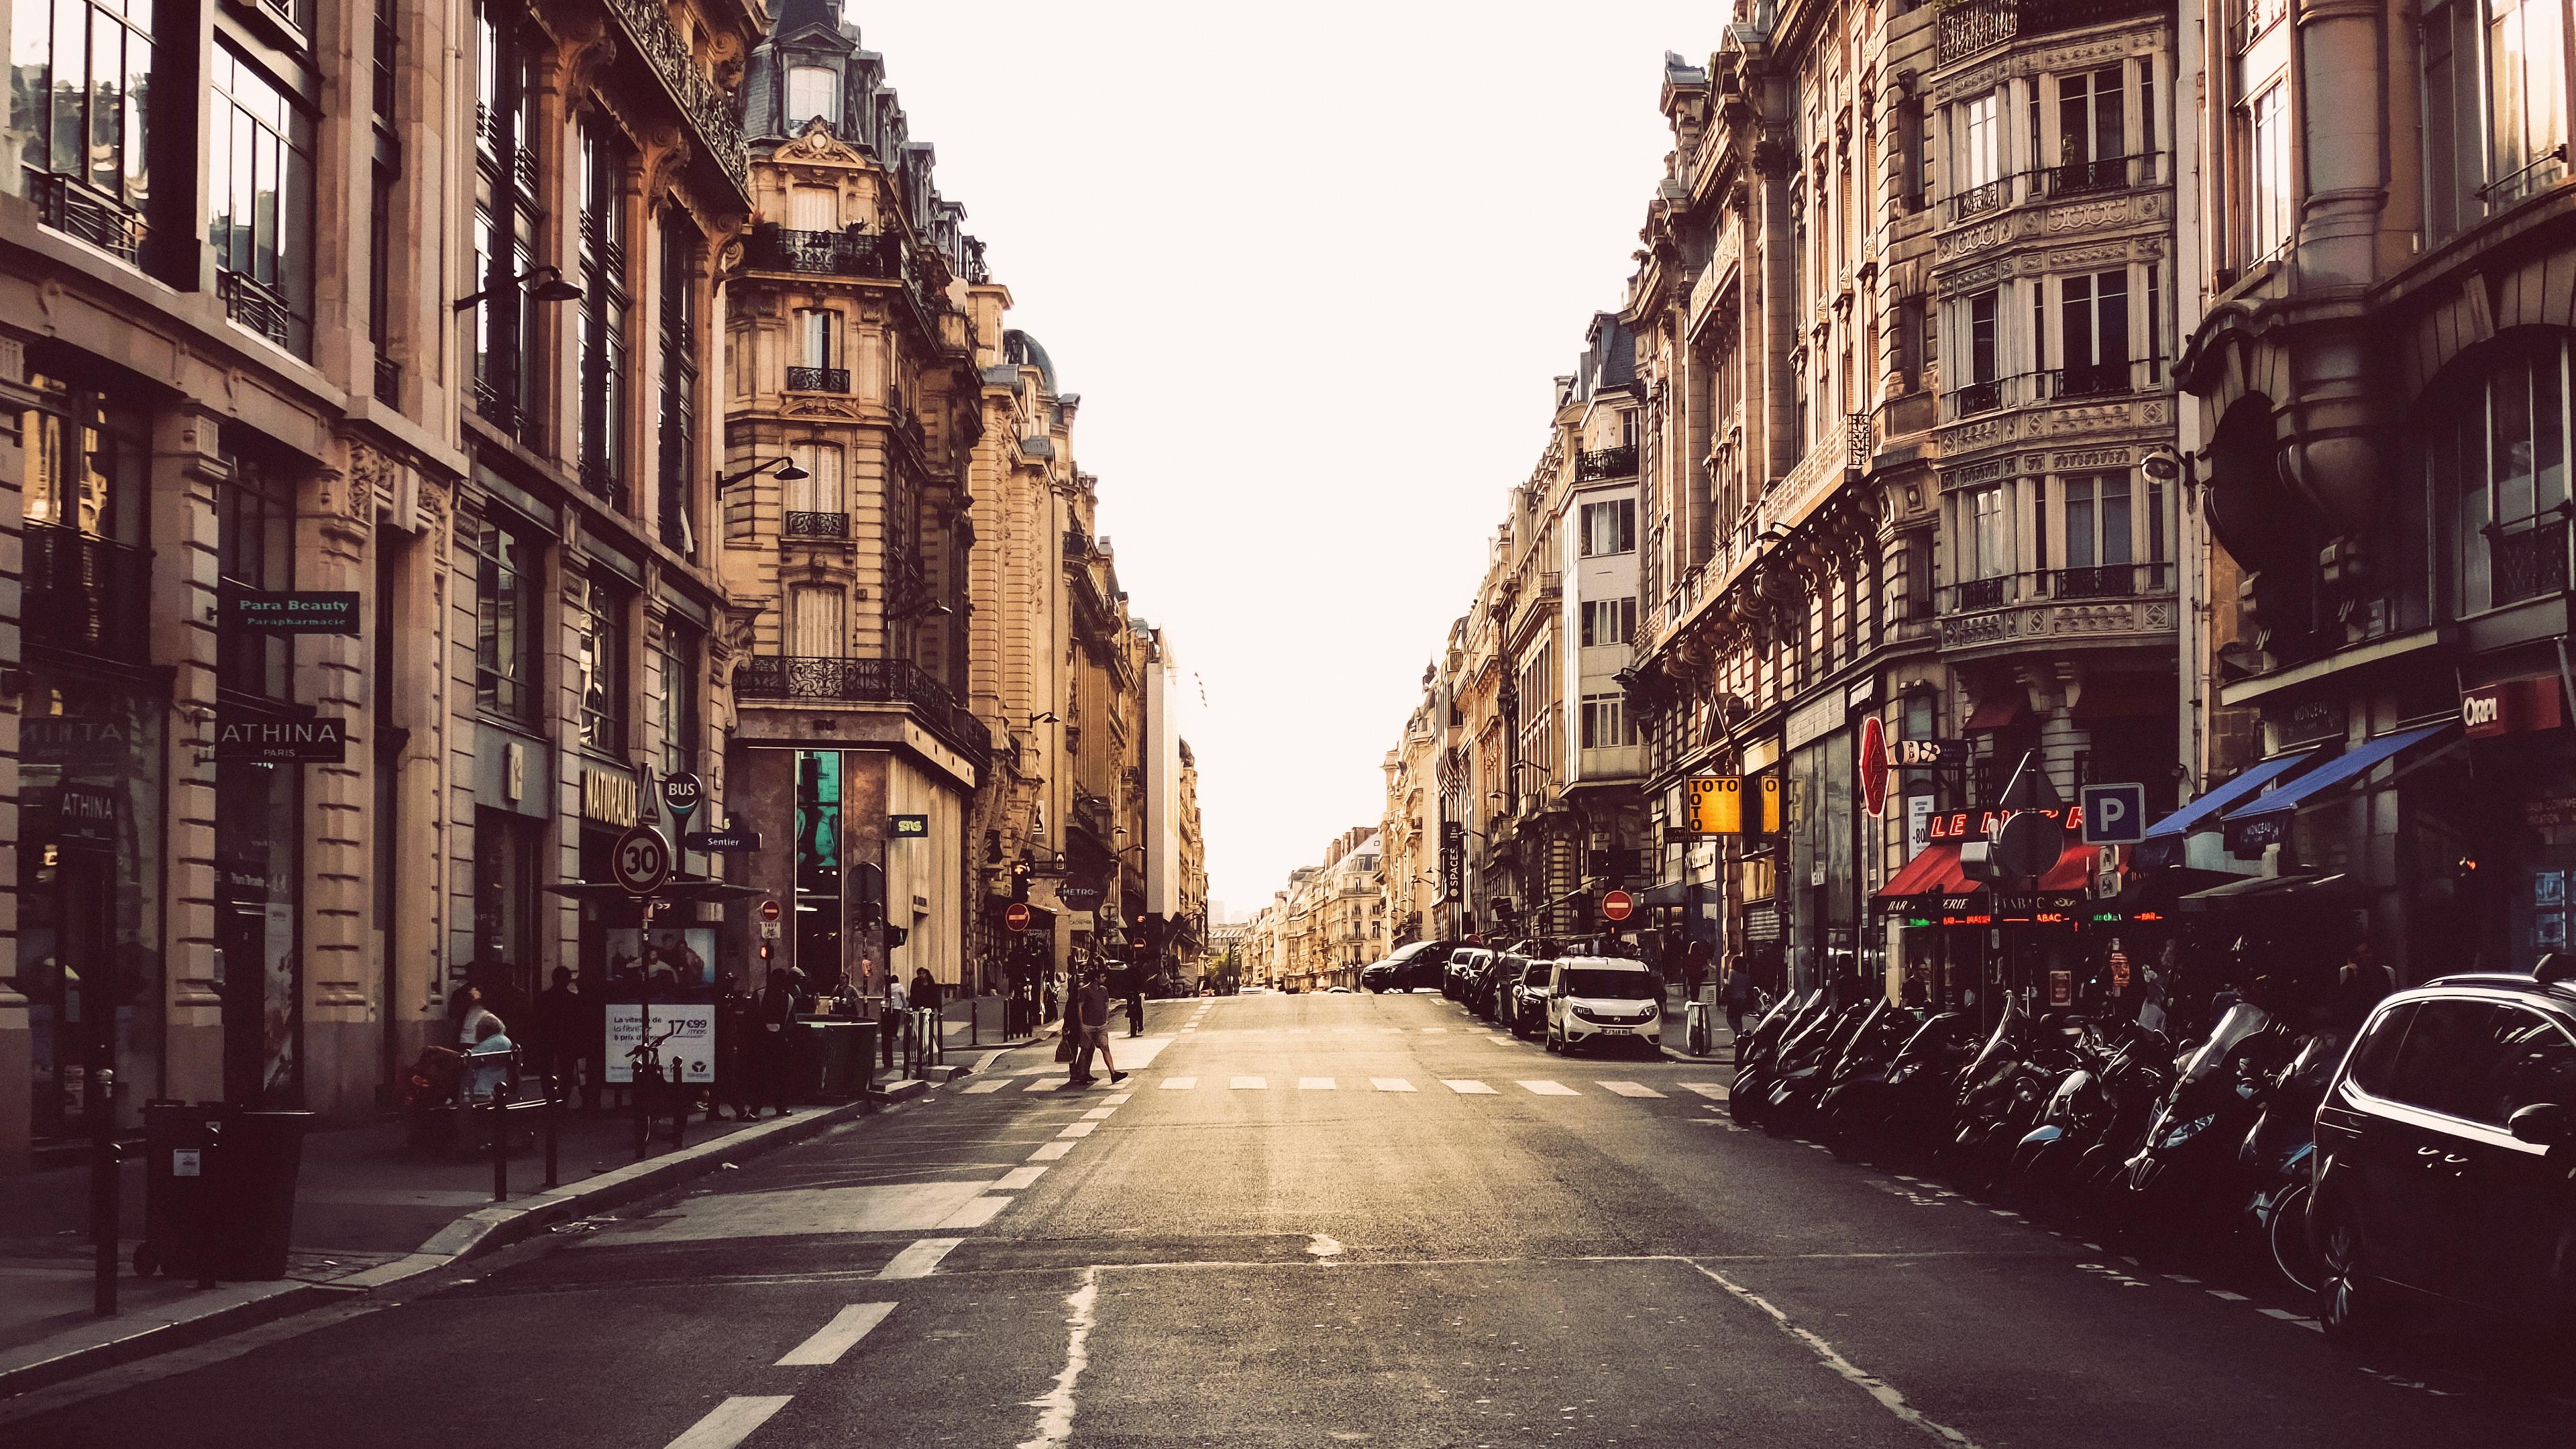 General 3840x2160 street urban cityscape city photography road Paris